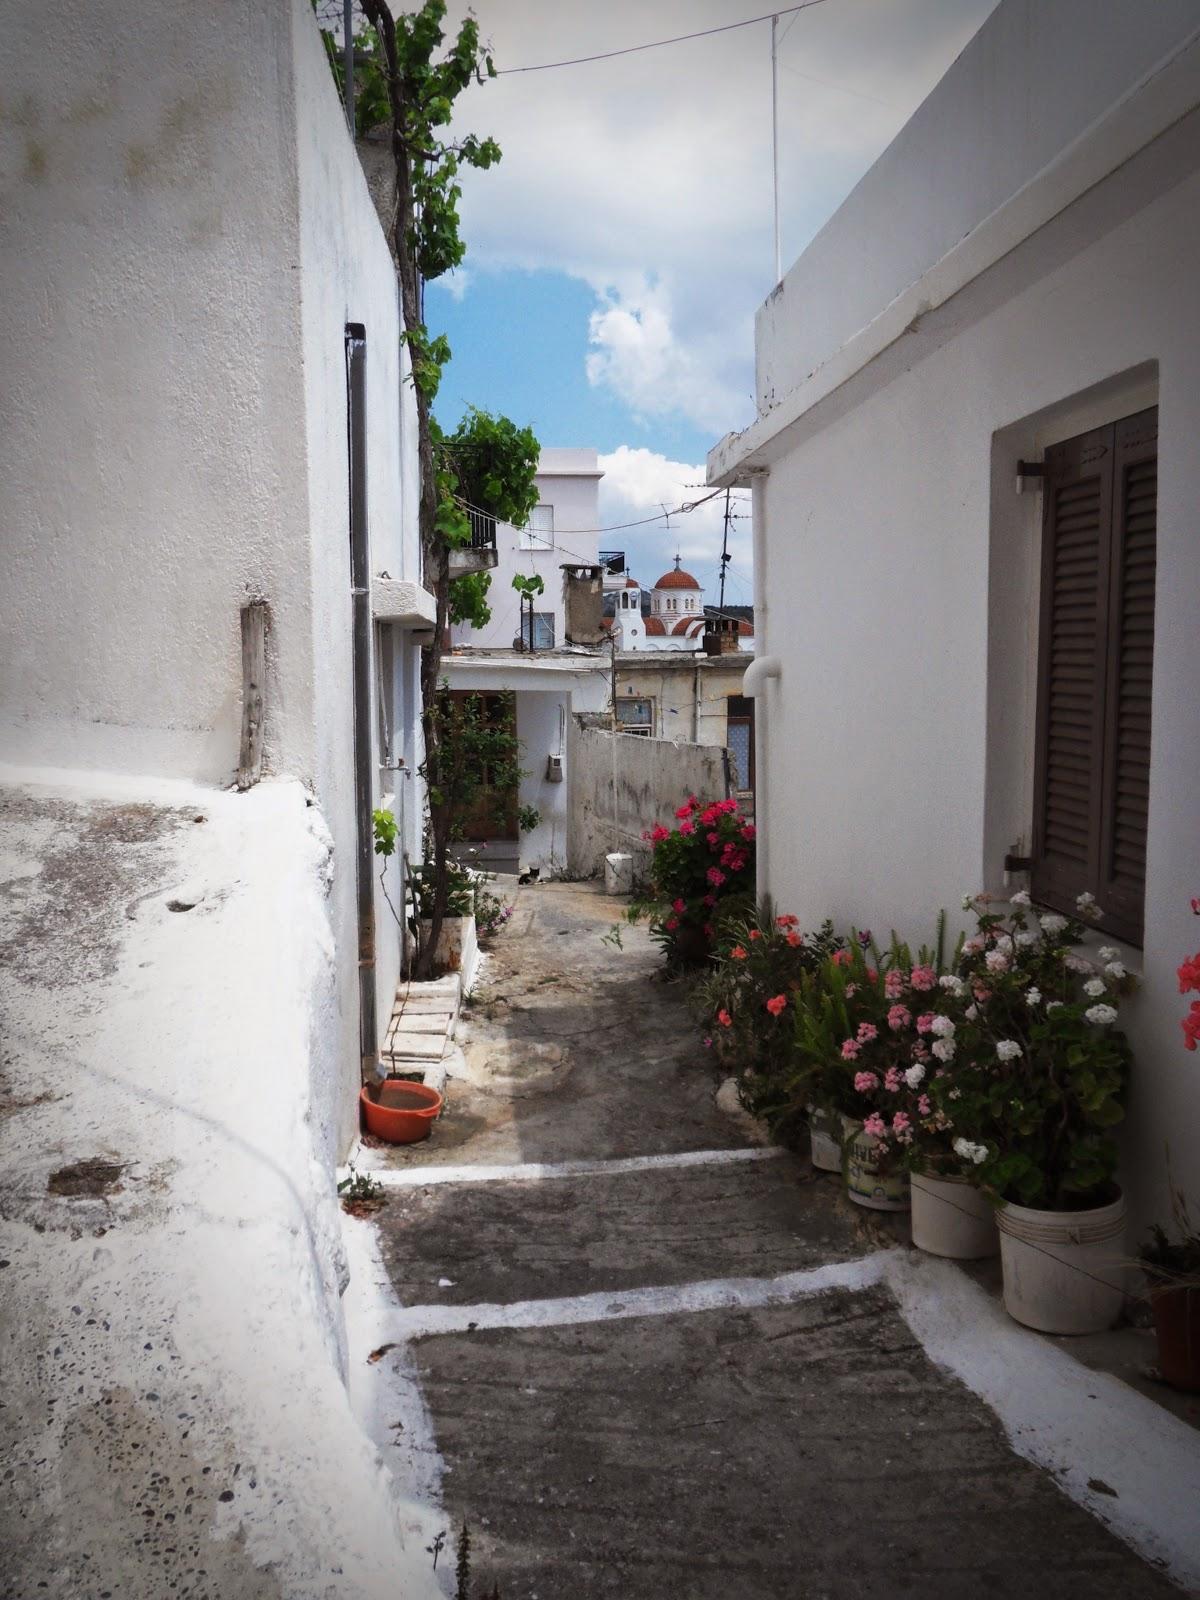 Crete mountain village